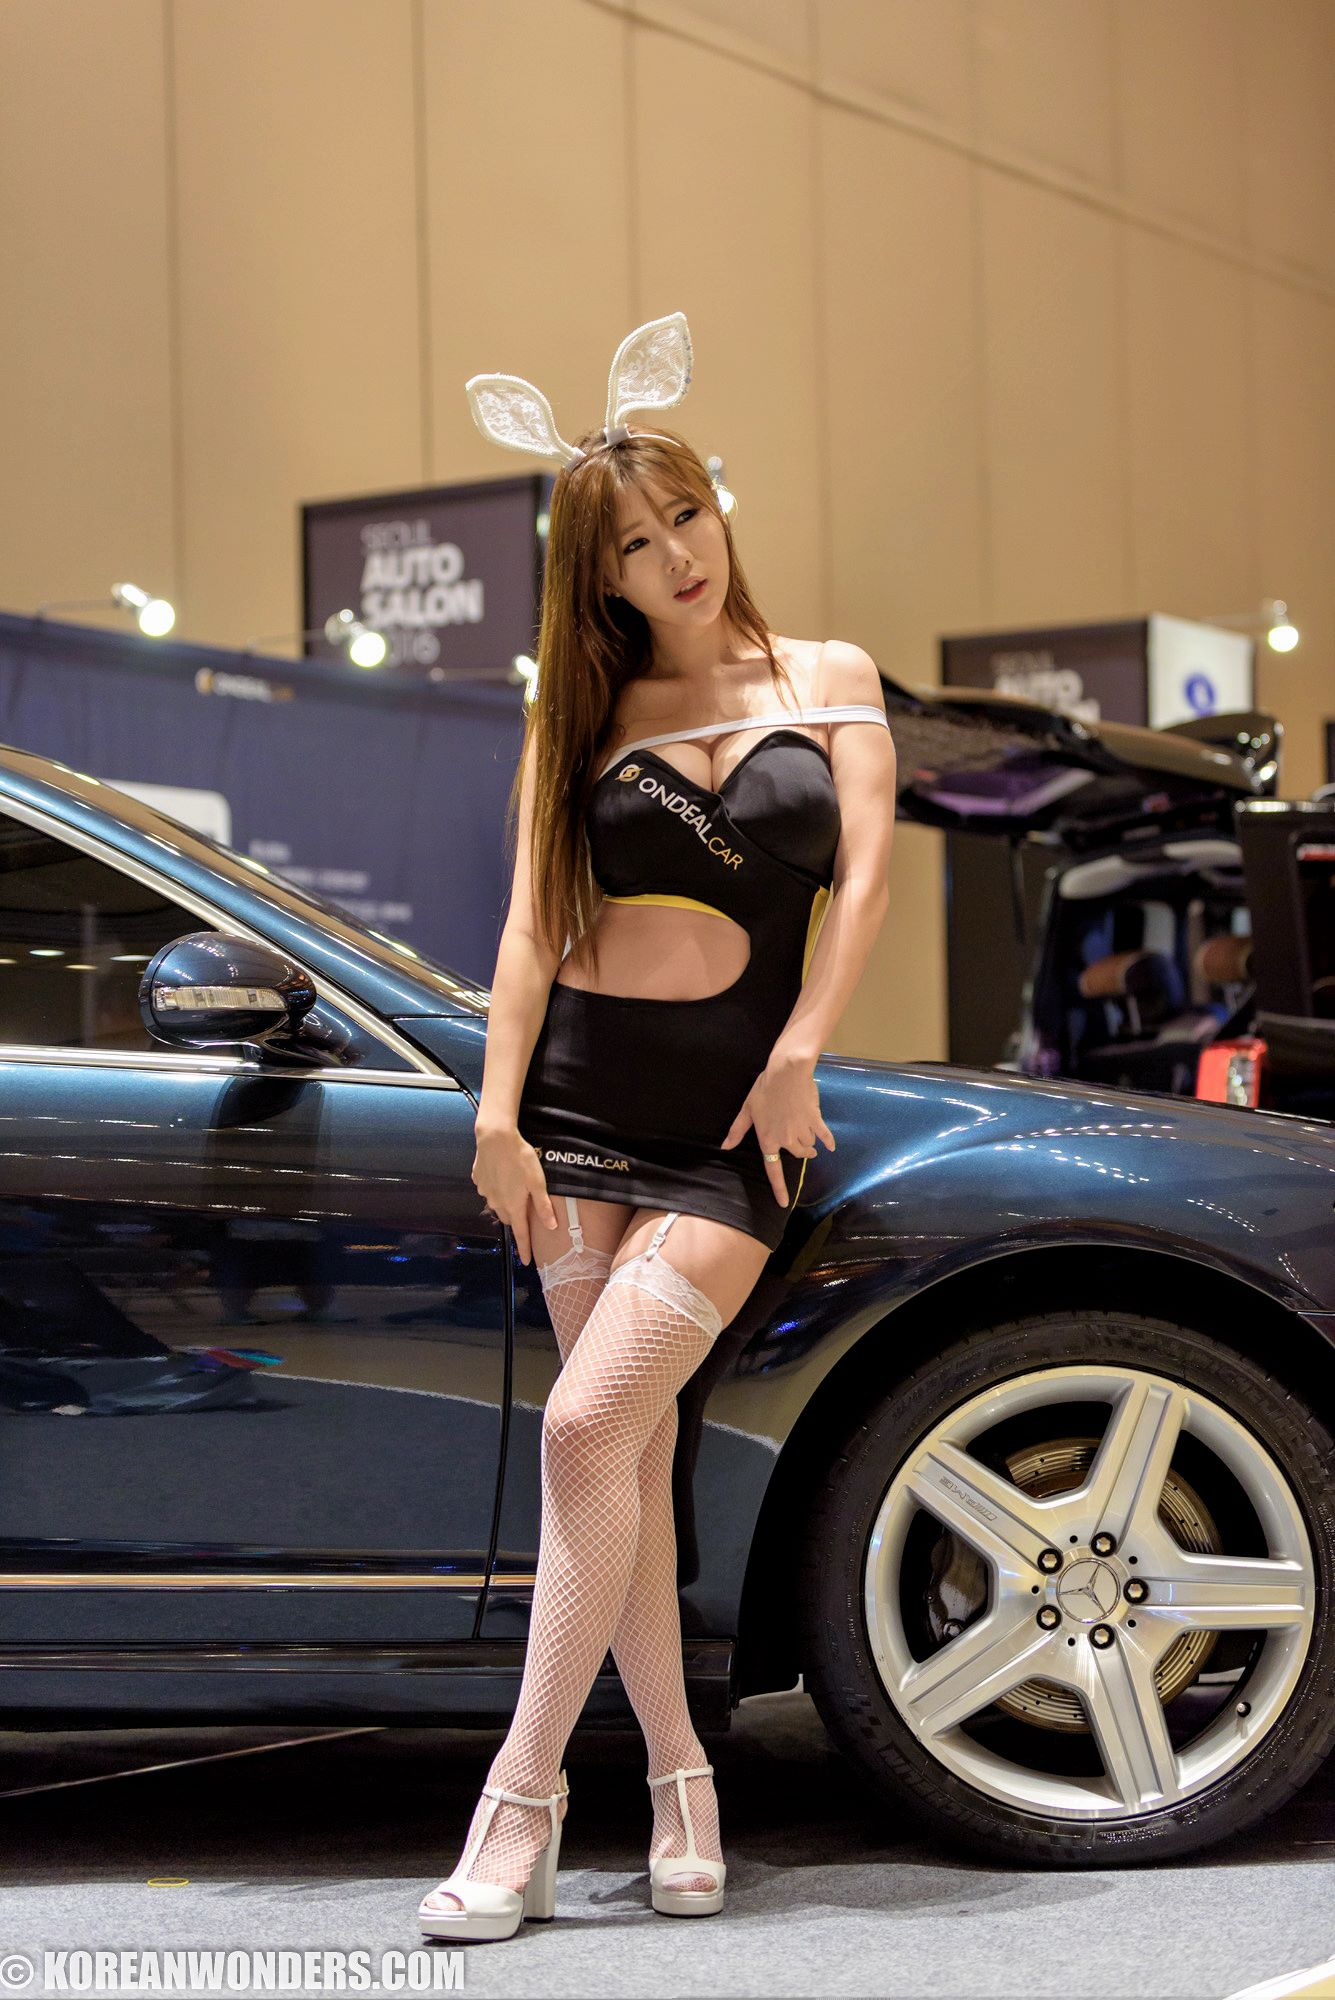 20160710_111259__KRW1576_2K8PF.jpg